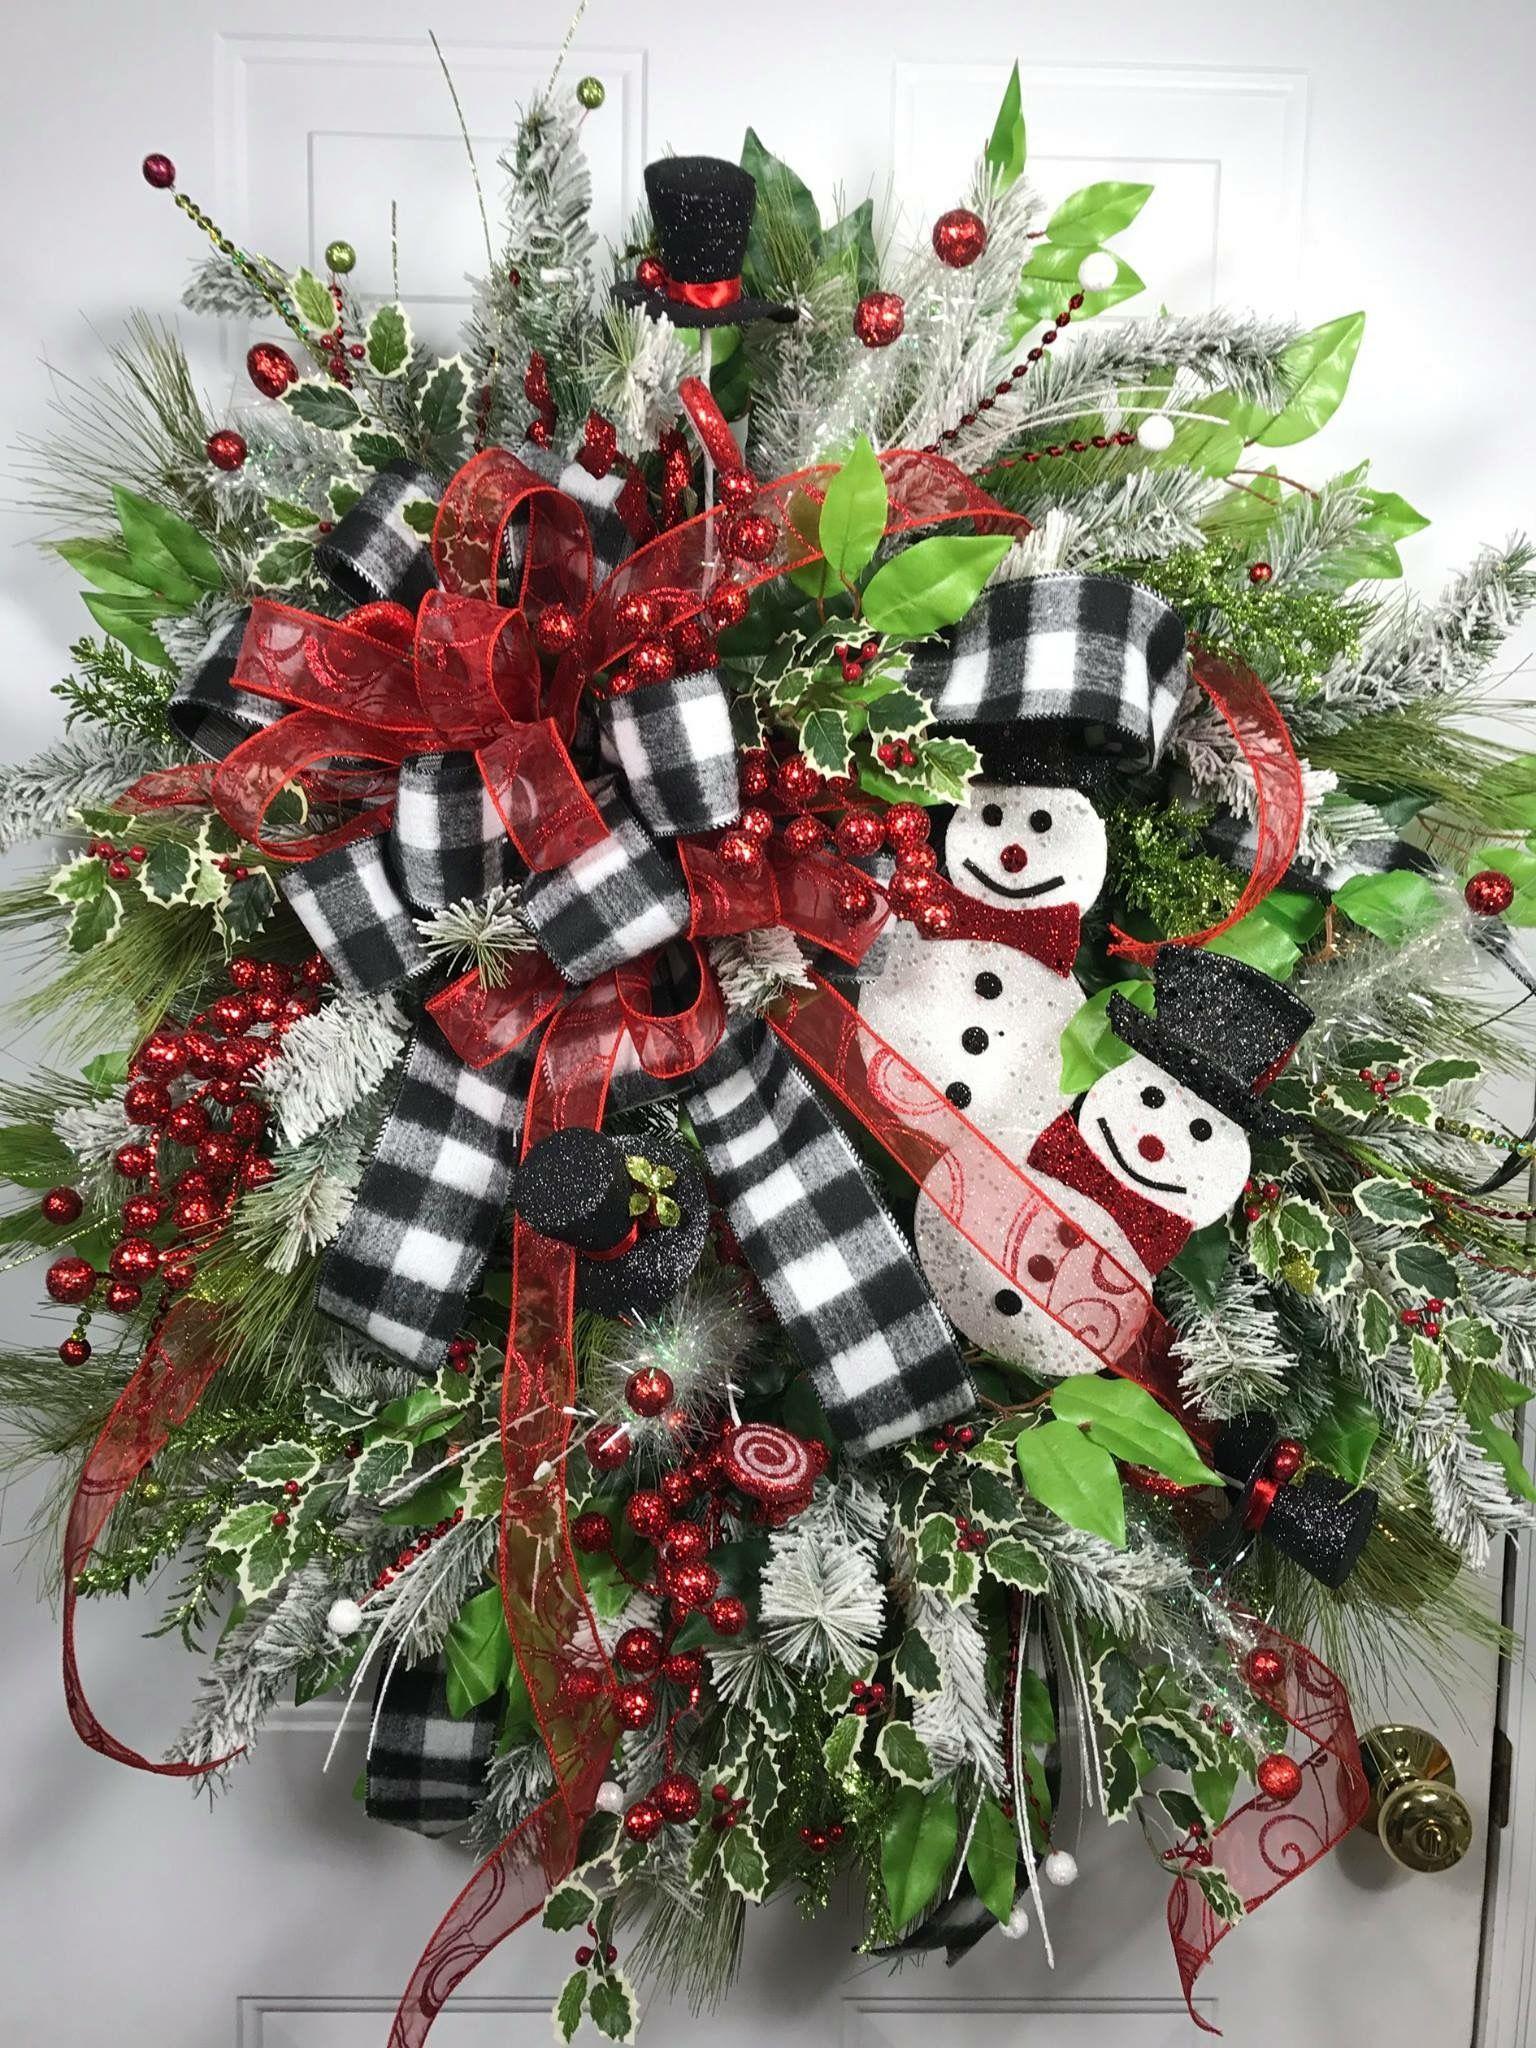 Snowman Wreath Christmas Wreath Seasonal Door Decor Holiday By Ladybug